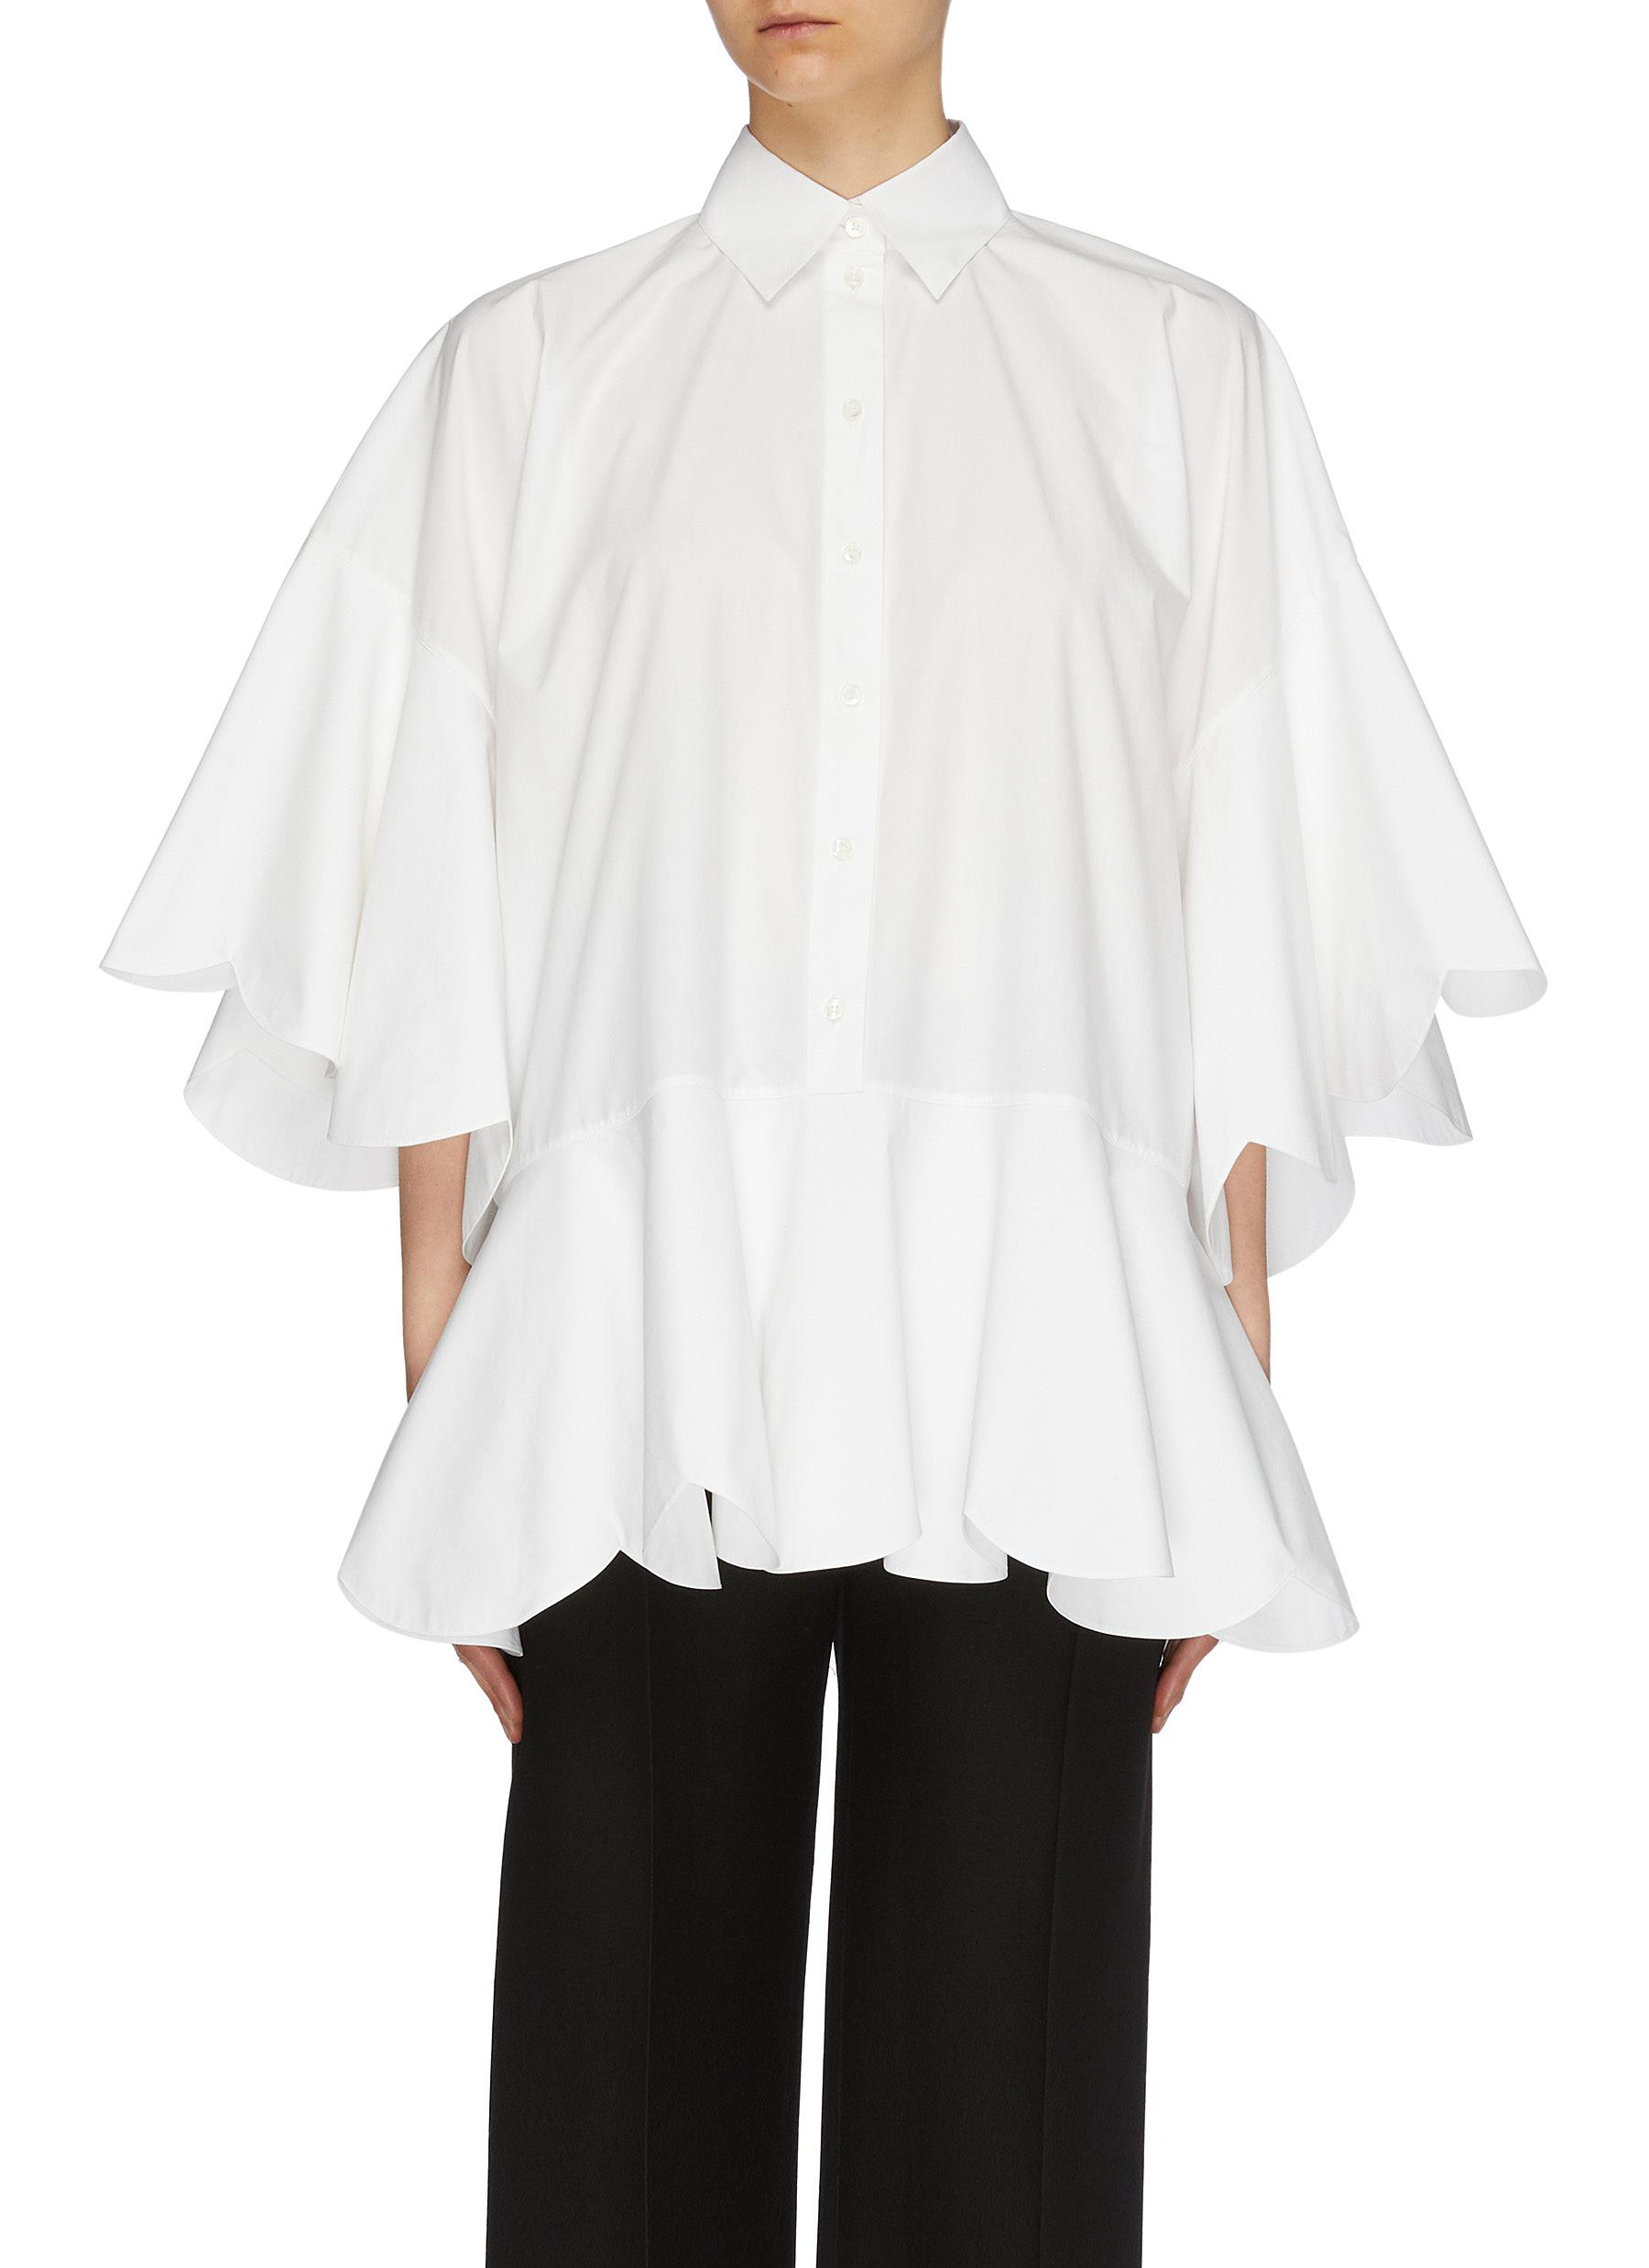 Scalloped ruffle sleeve peplum shirt by Valentino